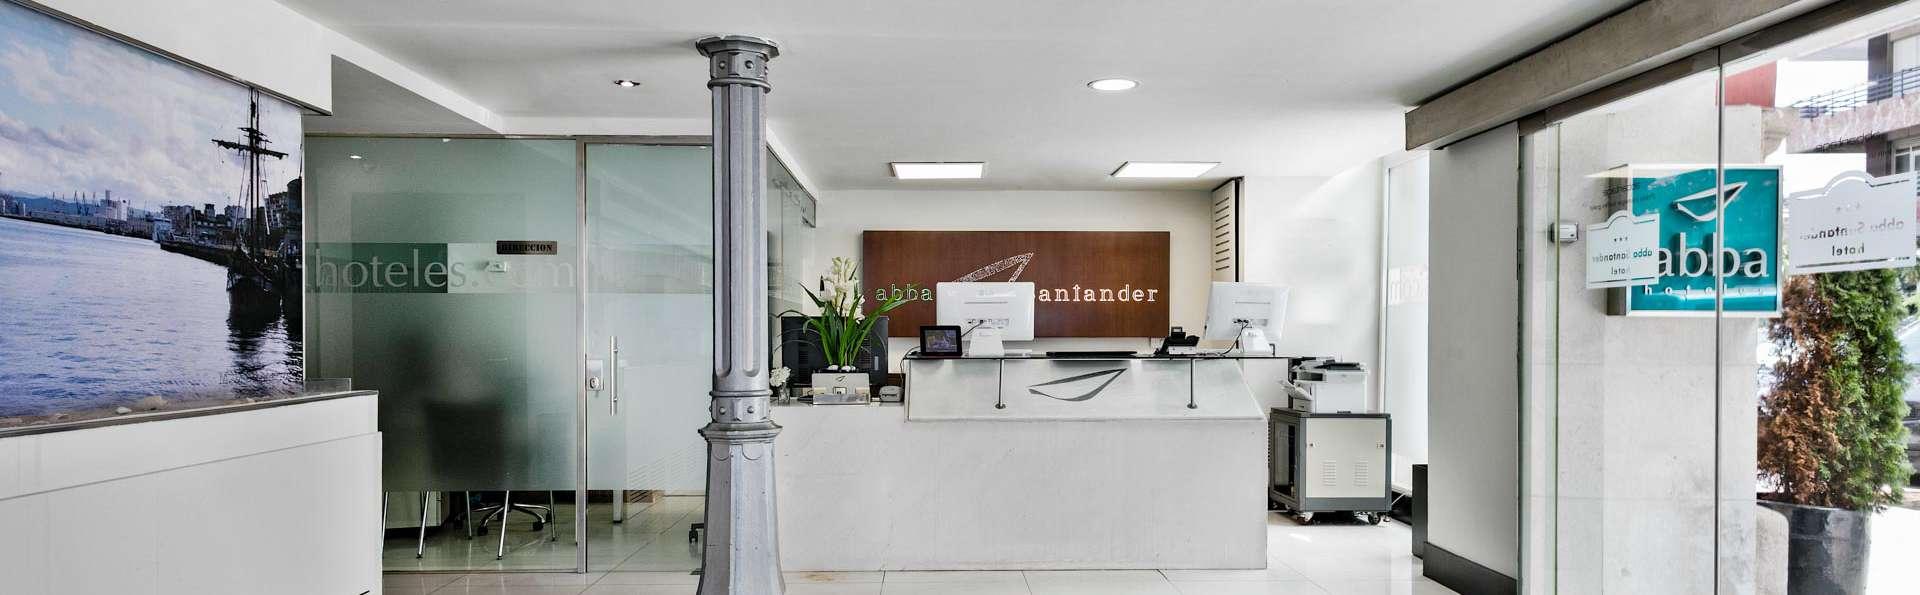 Hotel Abba Santander - EDIT_LOBBY_04.jpg